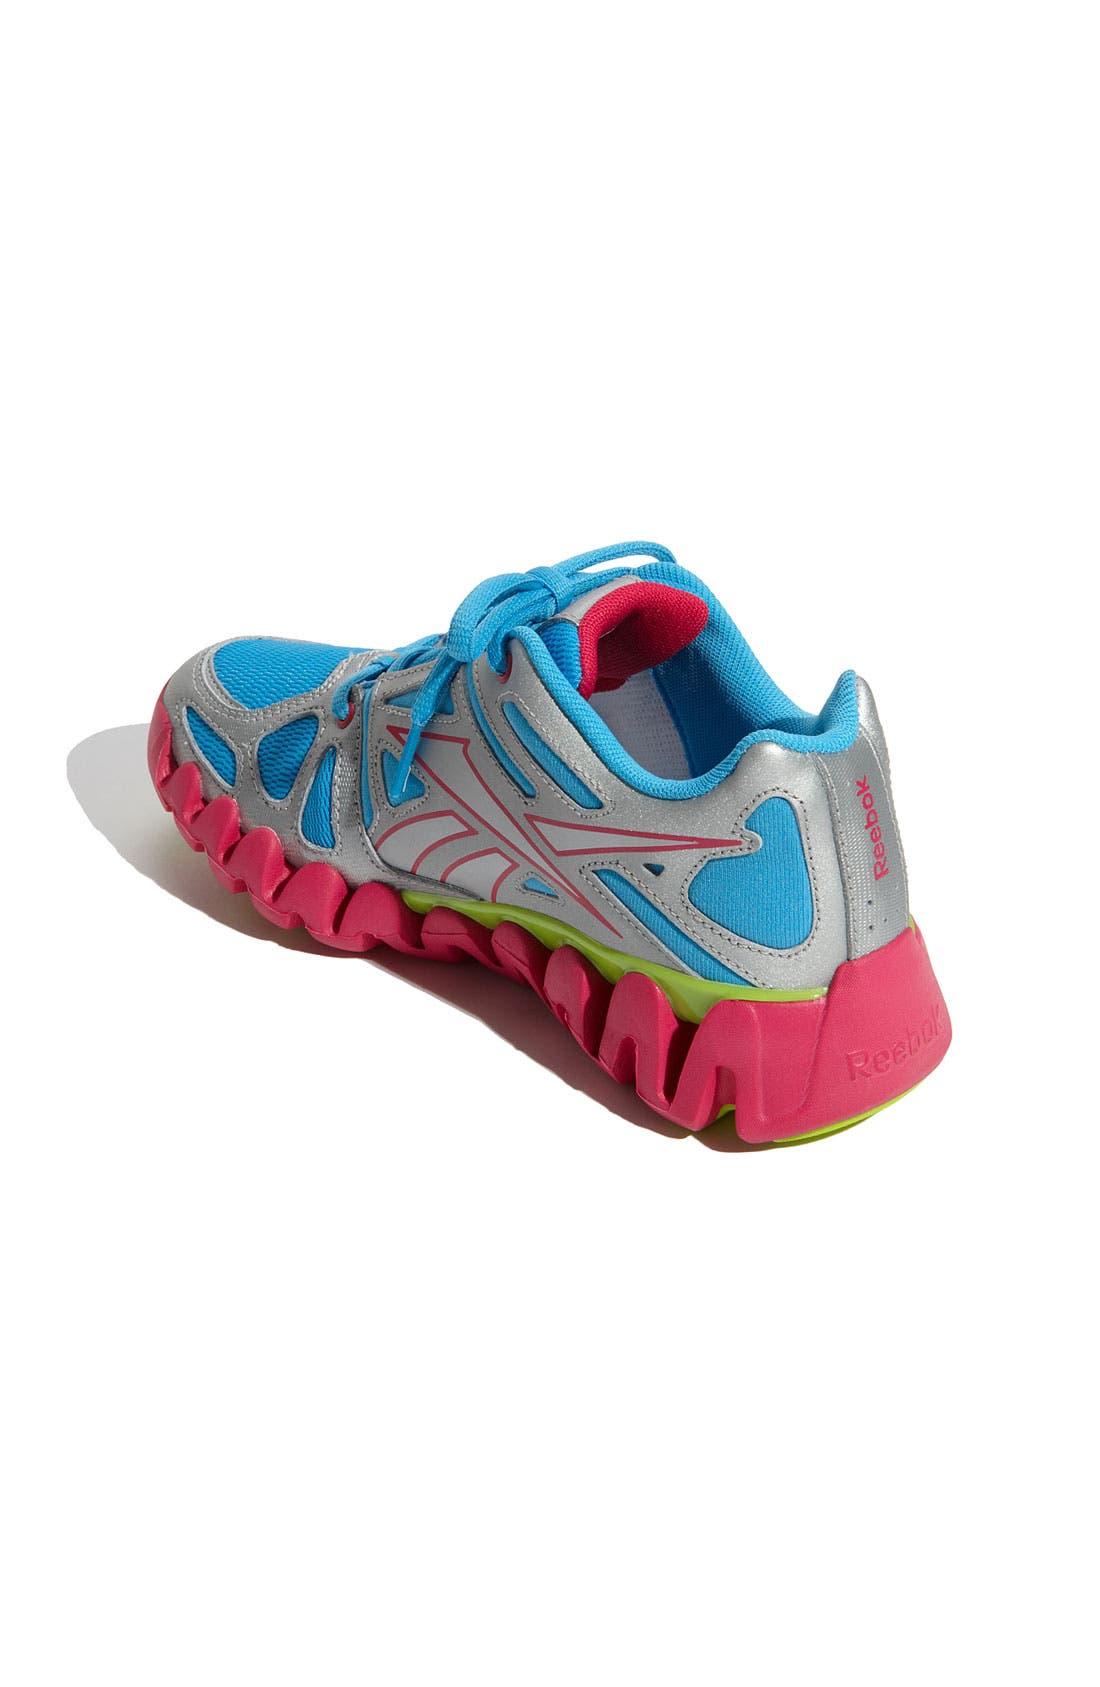 Alternate Image 2  - Reebok 'Zig Dynamic' Running Shoe (Baby, Walker, Toddler, Little Kid & Big Kid)